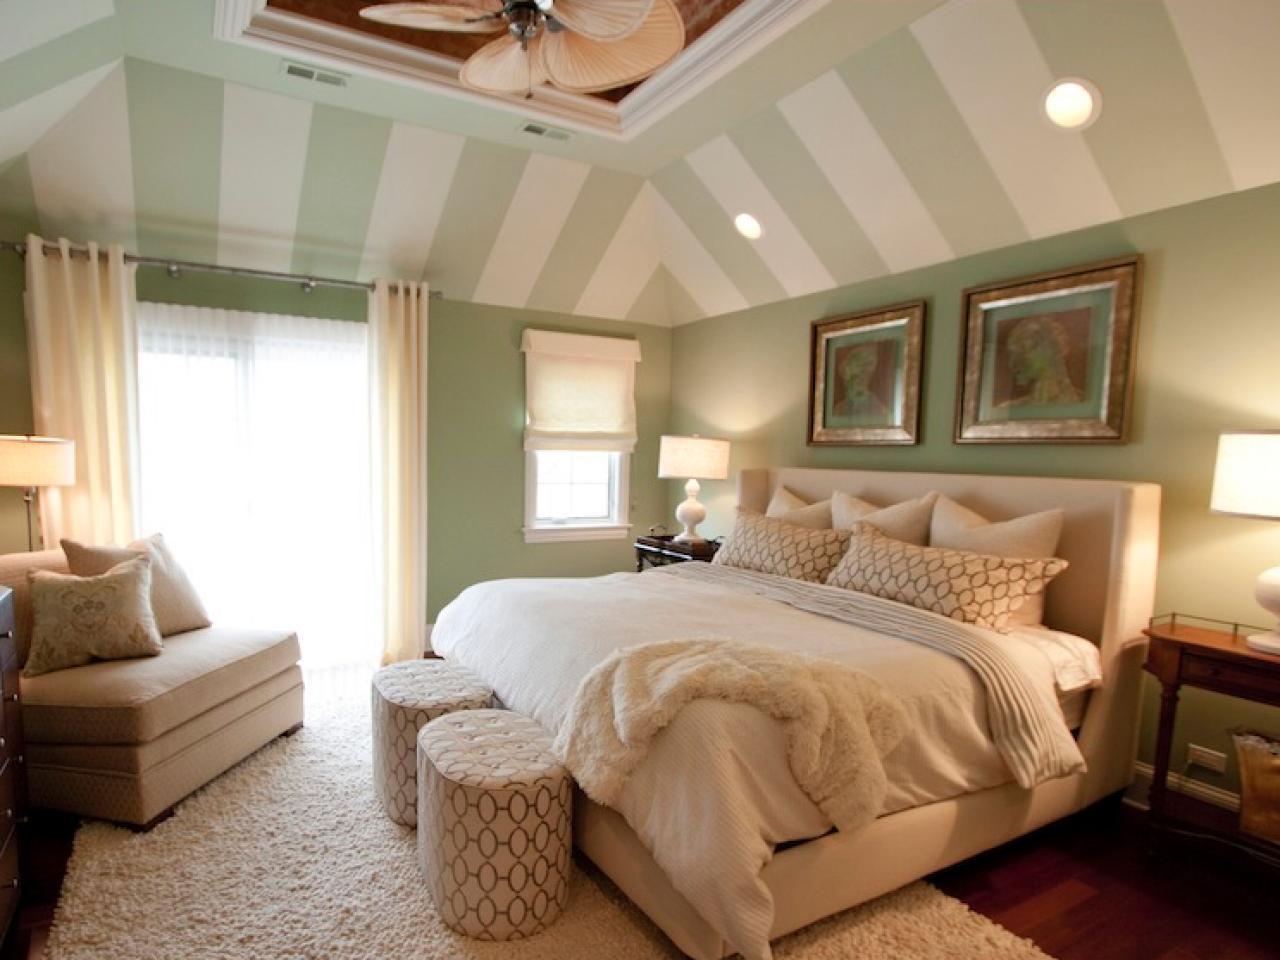 Nautical Bedroom Furniture Ideas - HomesFeed